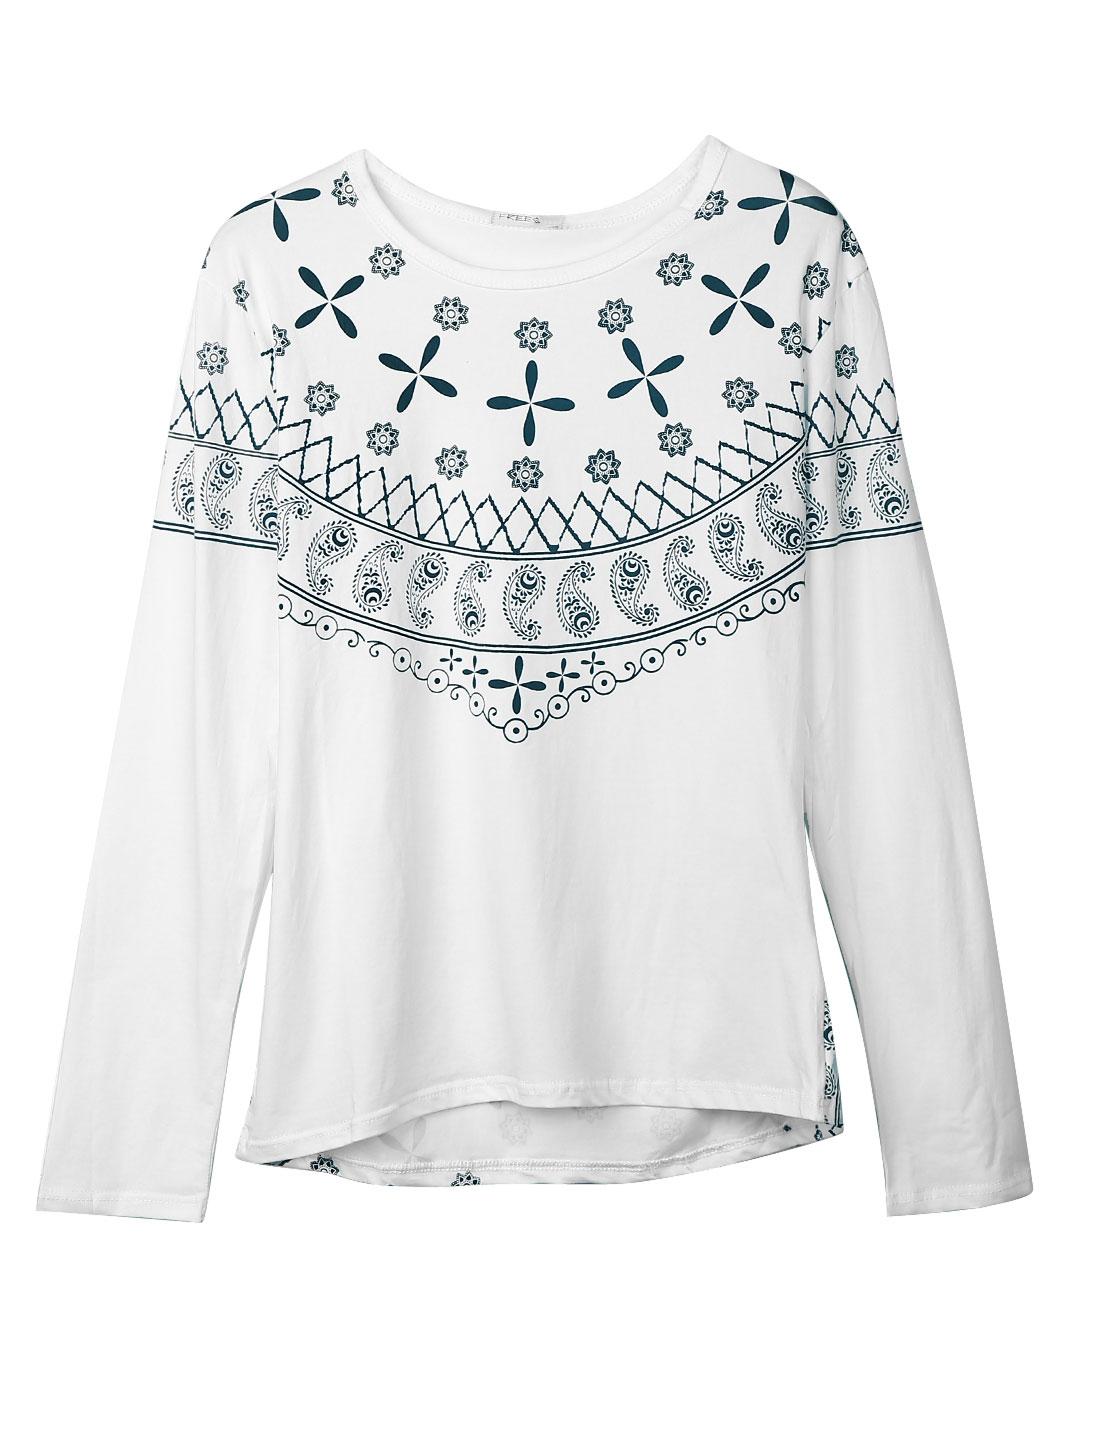 Men Paisleys Floral Prints Long Sleeve Casual Shirt White M